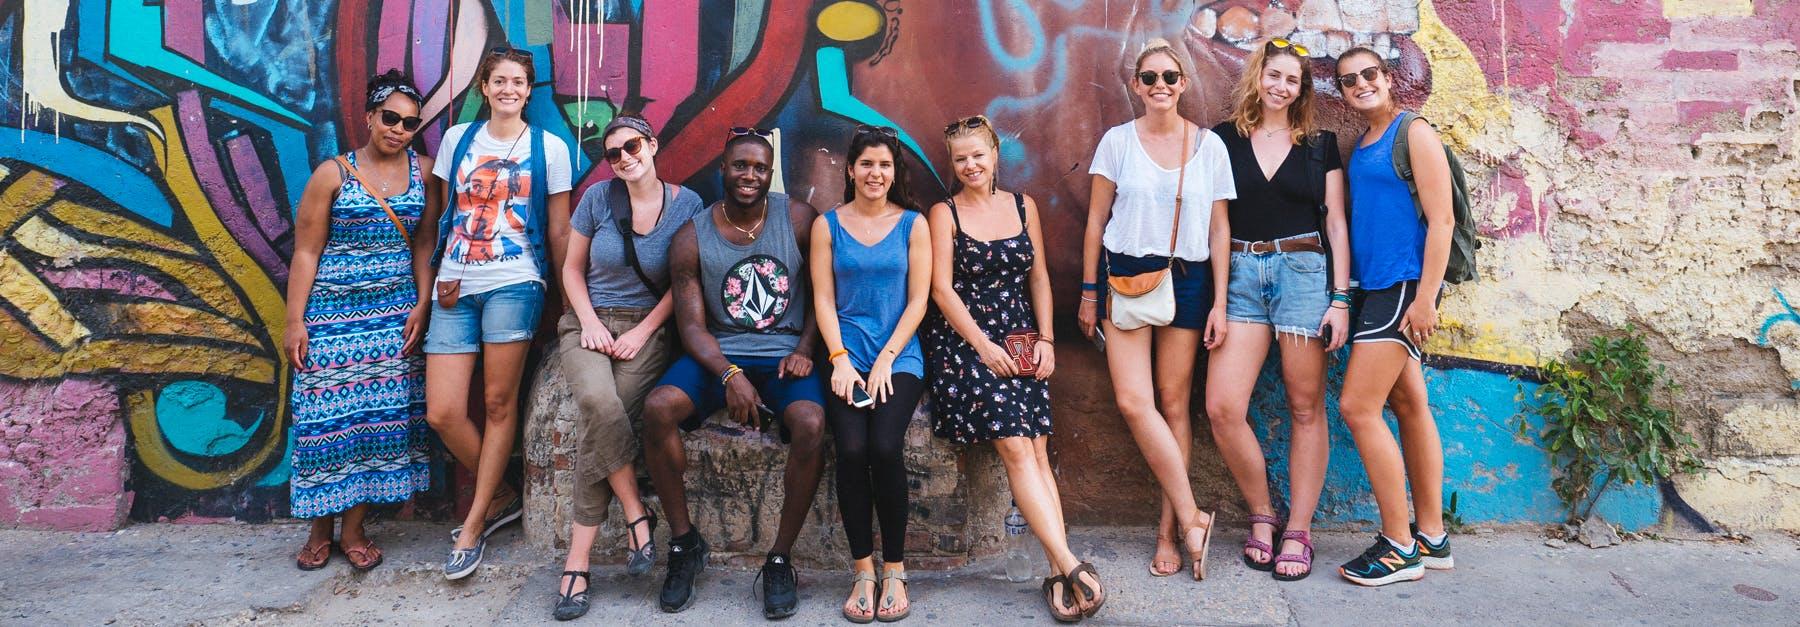 Volunteer abroad as a group with International Volunteer HQ